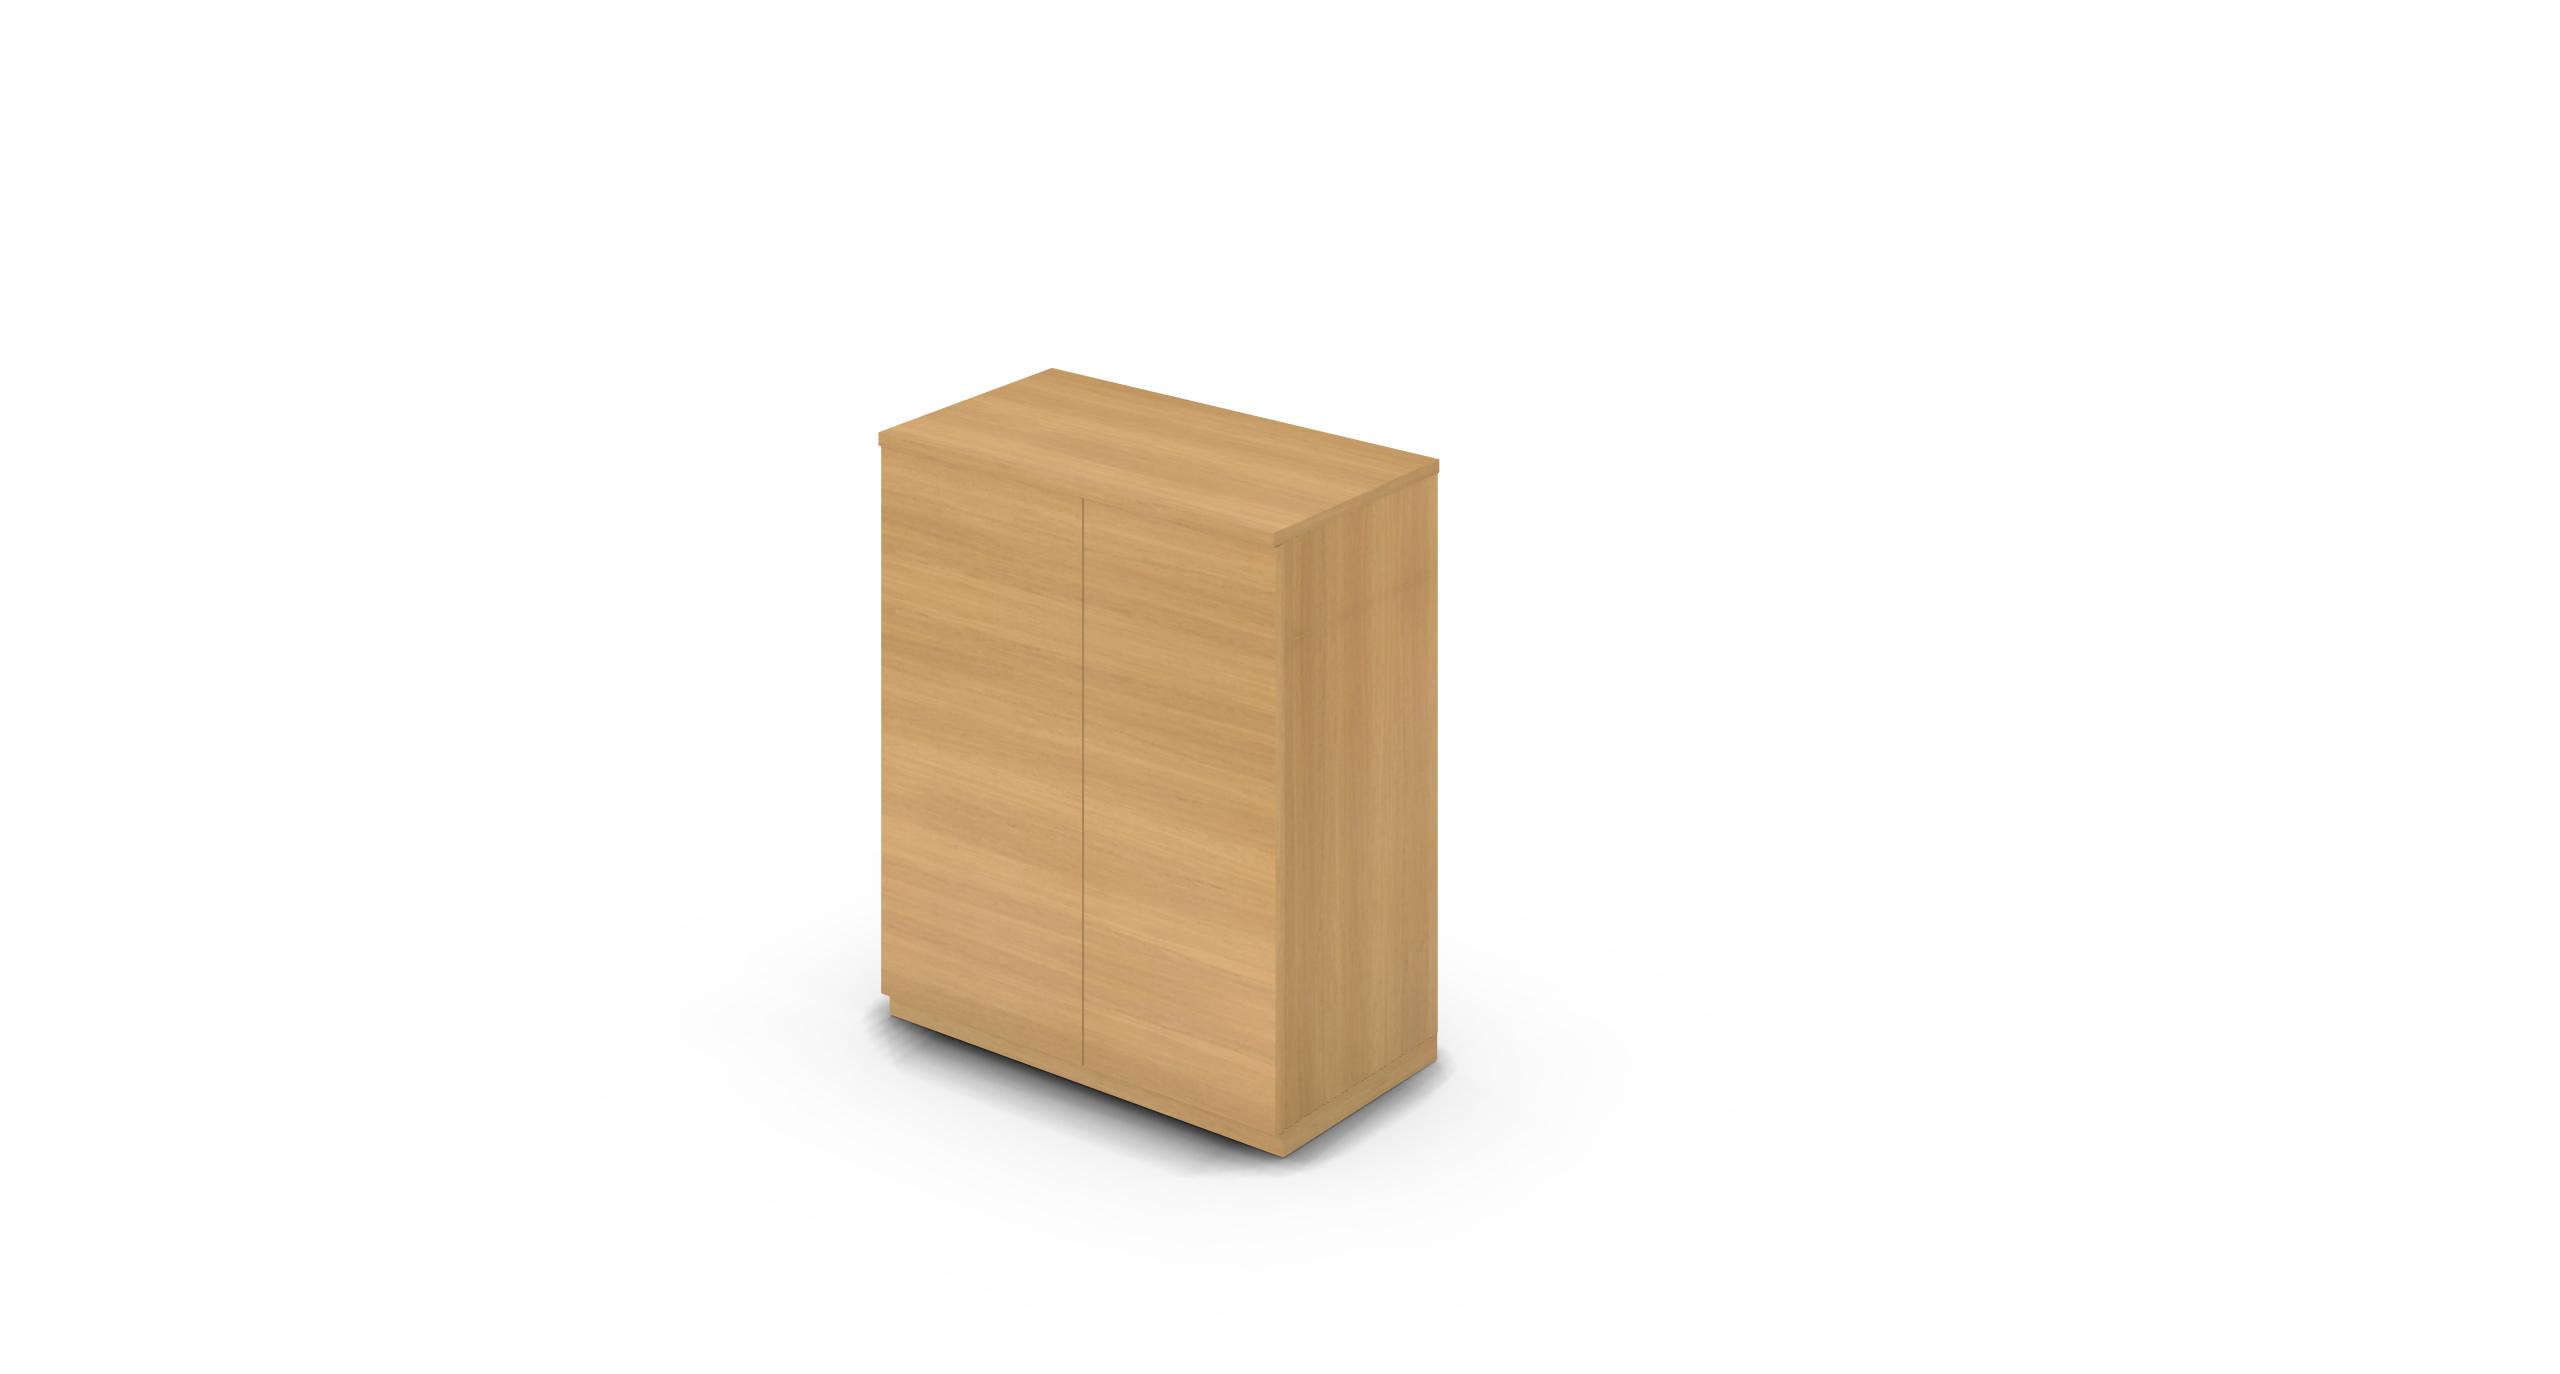 Cabinet_800x450x1125_HD_Oak_Push_NoCylinder